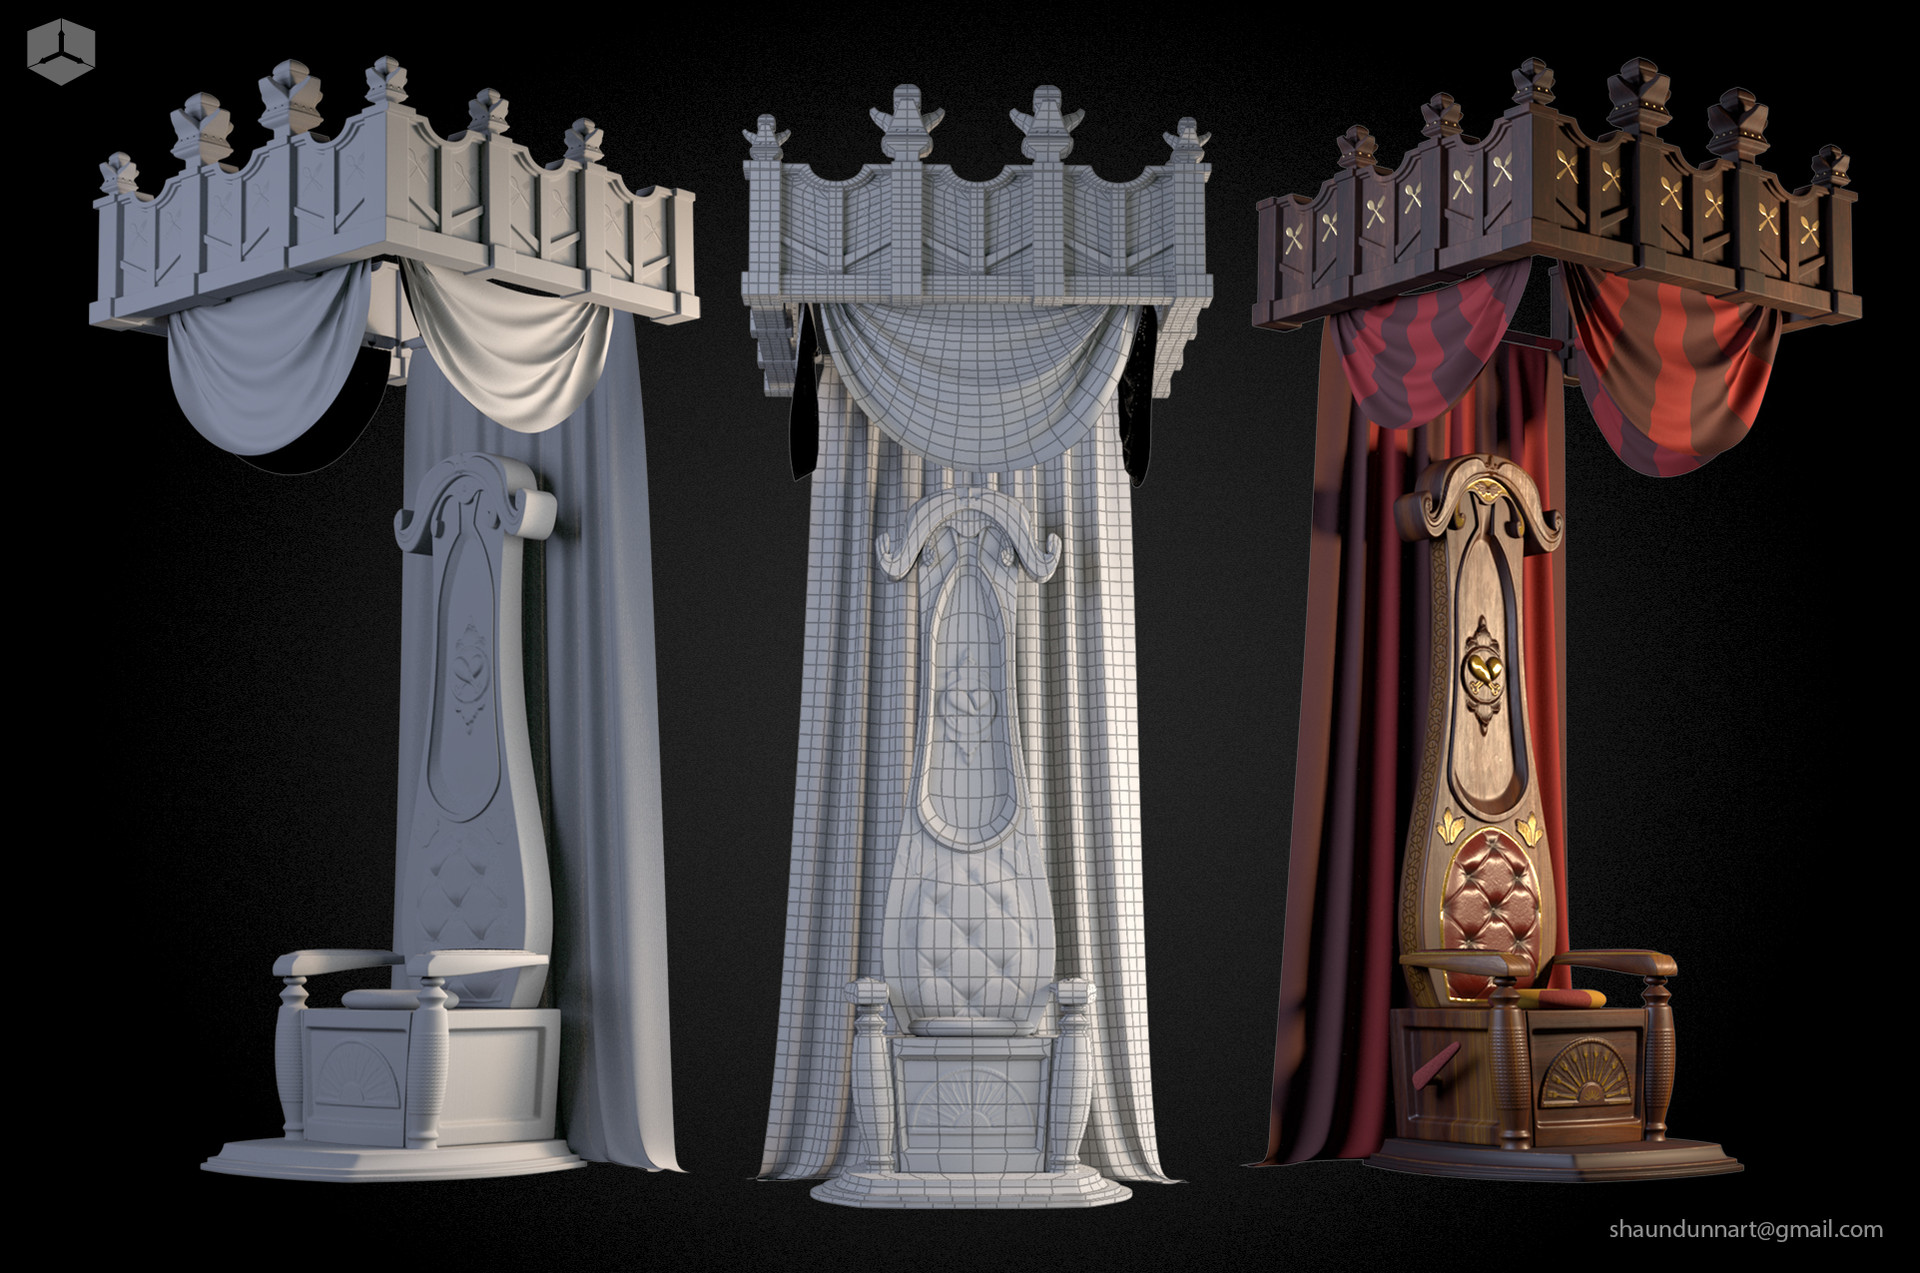 King Boggart's throne spread.